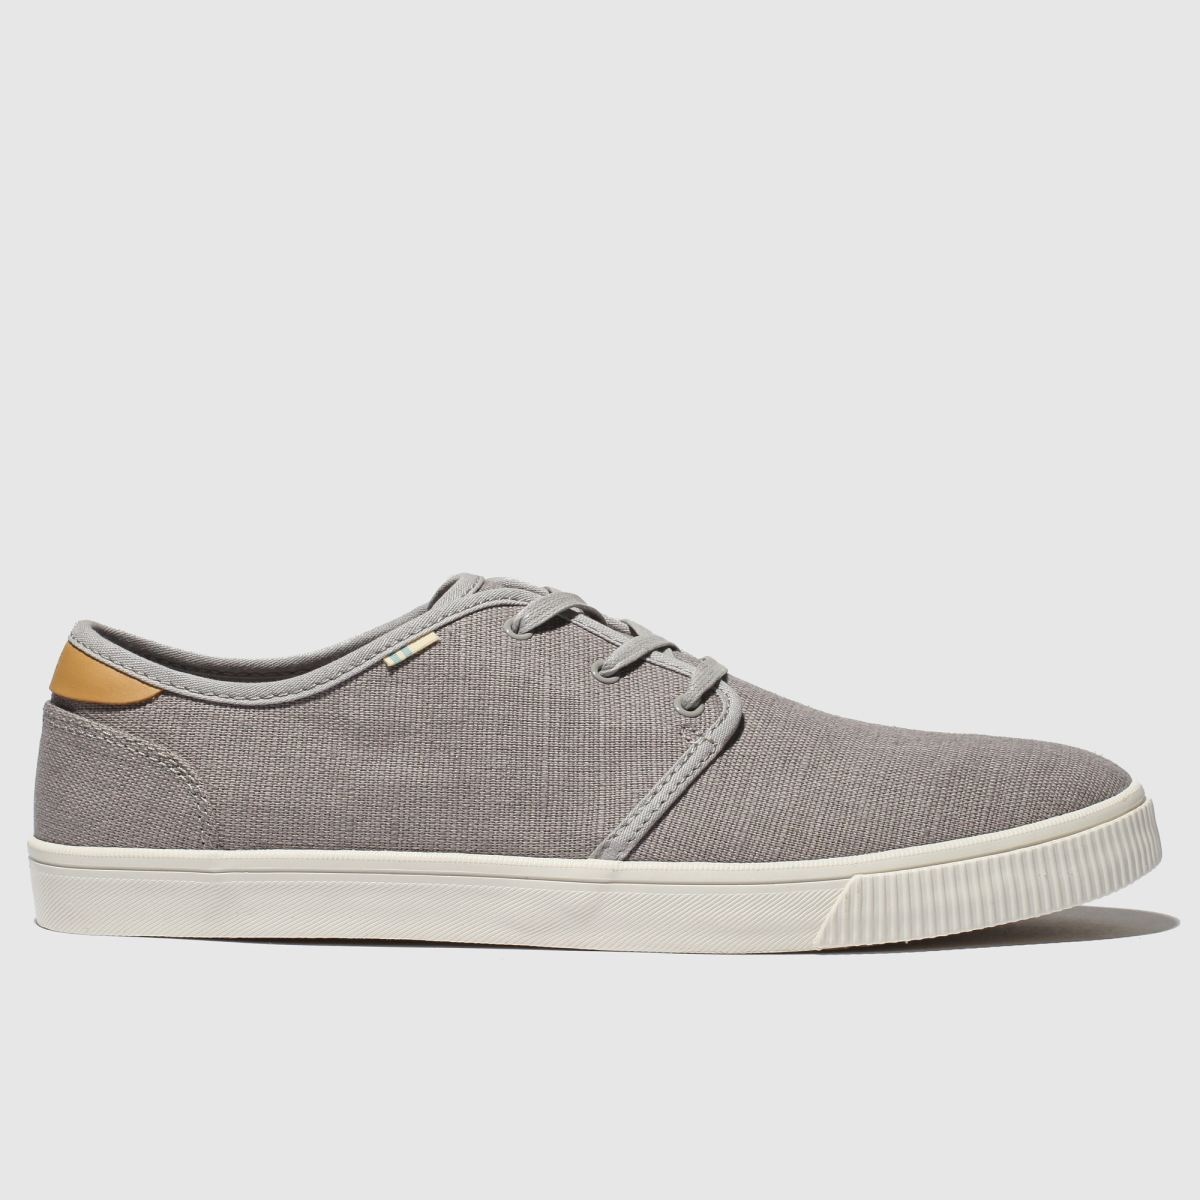 Toms Grey Carlo Shoes